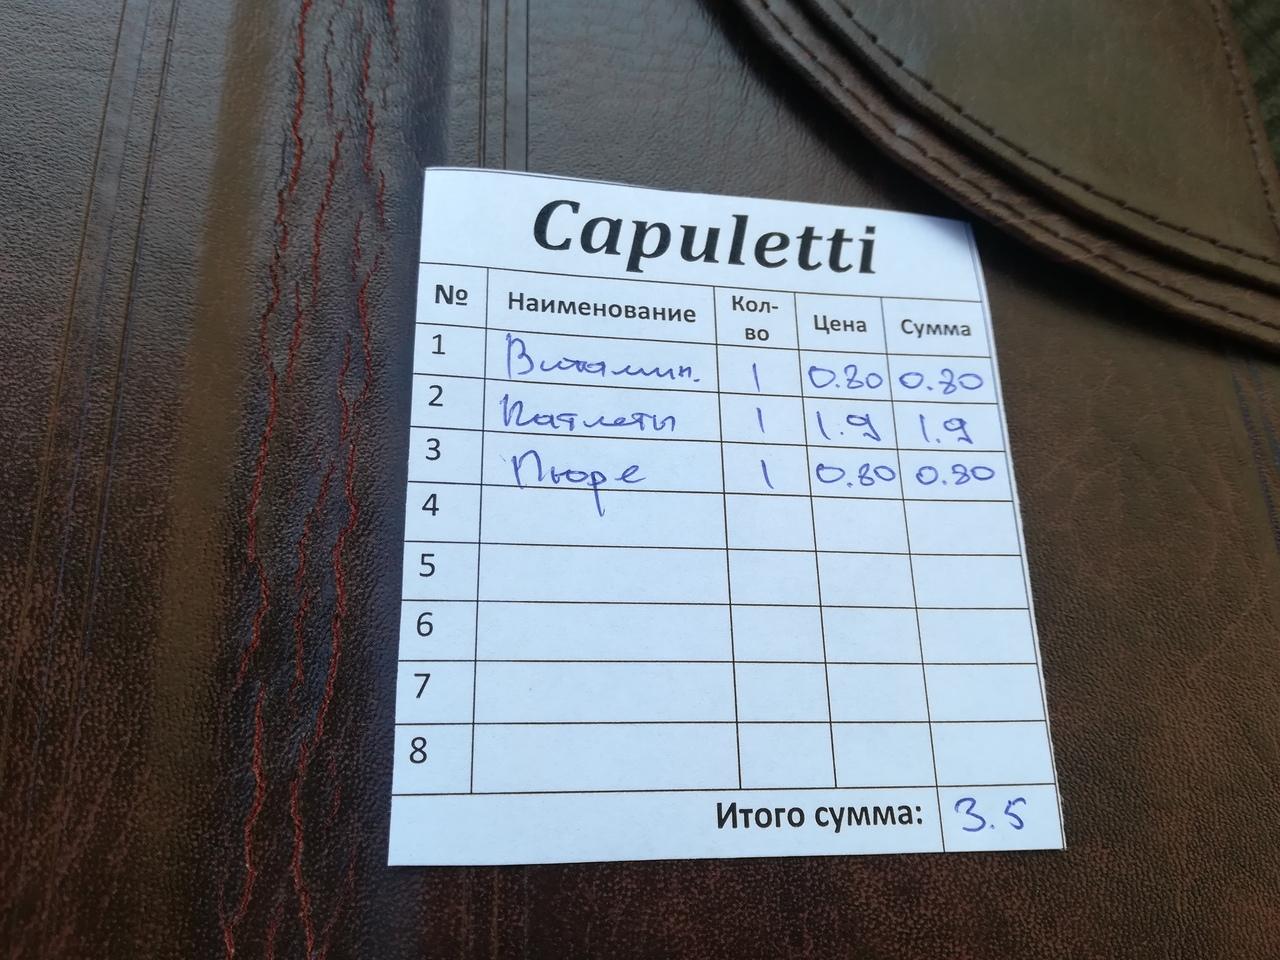 Рейд по барановичскому общепиту. Кафе «Capuletti» — Intex-press. Последние новости города Барановичи, Беларуси и Мира